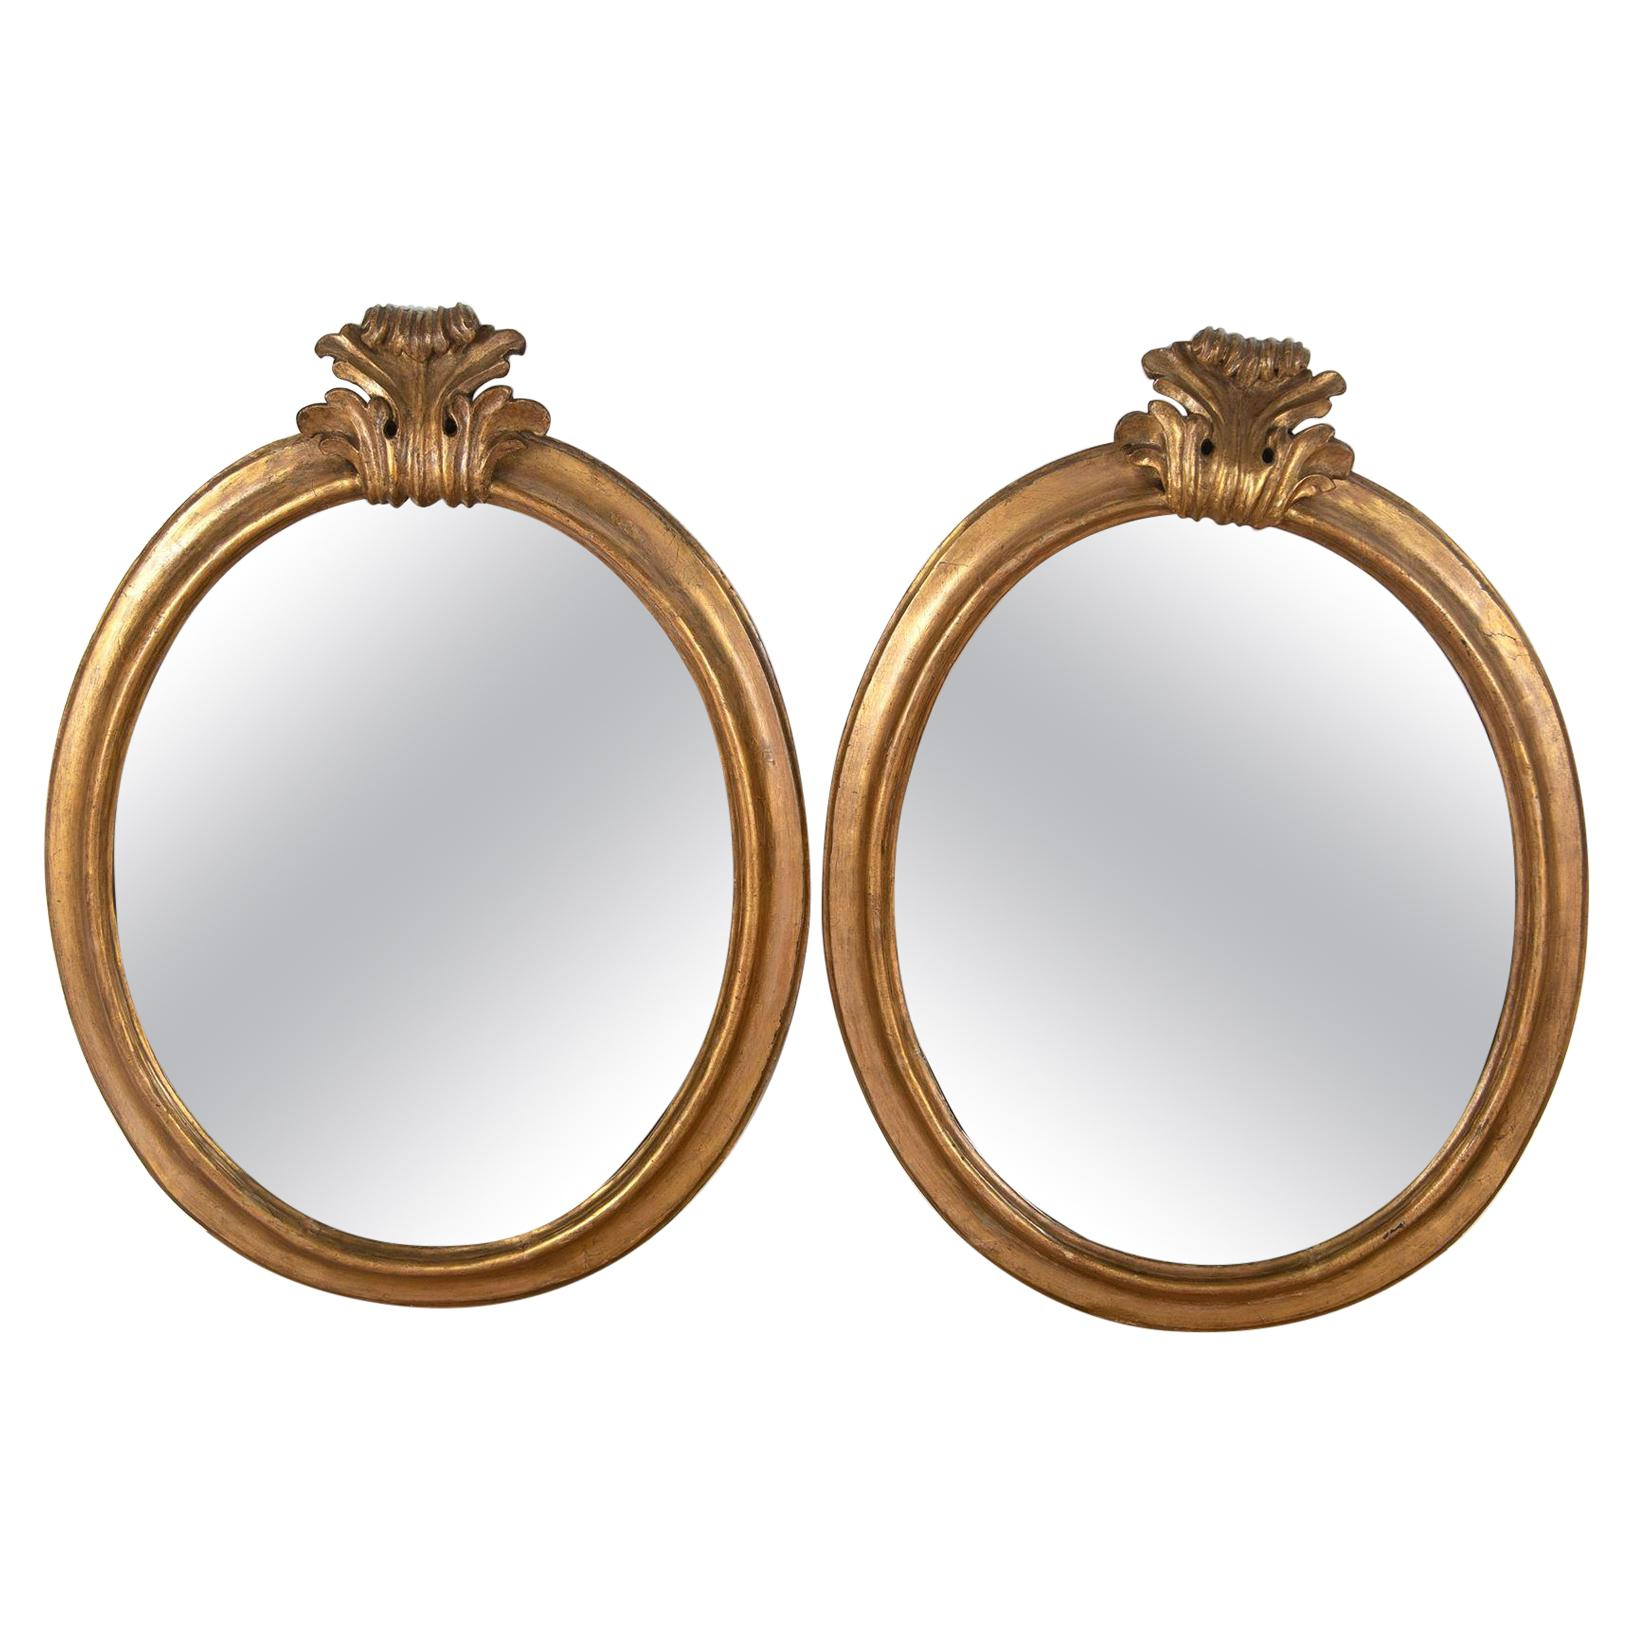 19th Century Italian Gilded Oval Mirrors